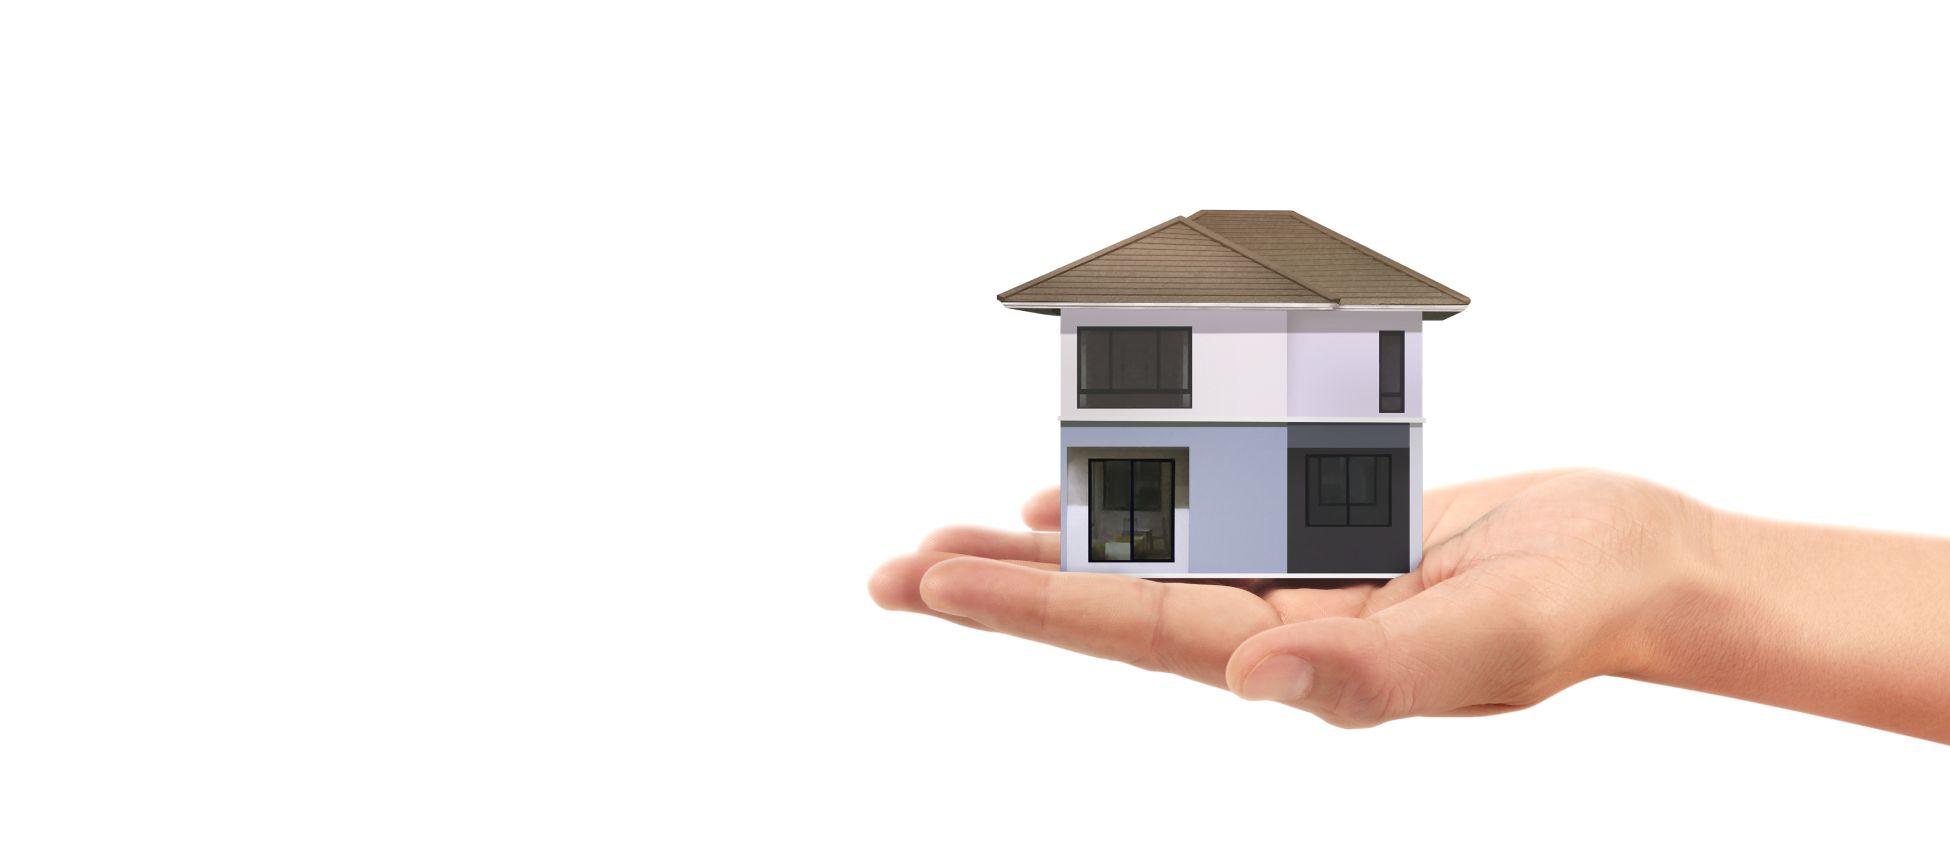 Estate Planning Help: Post-Divorce Changes